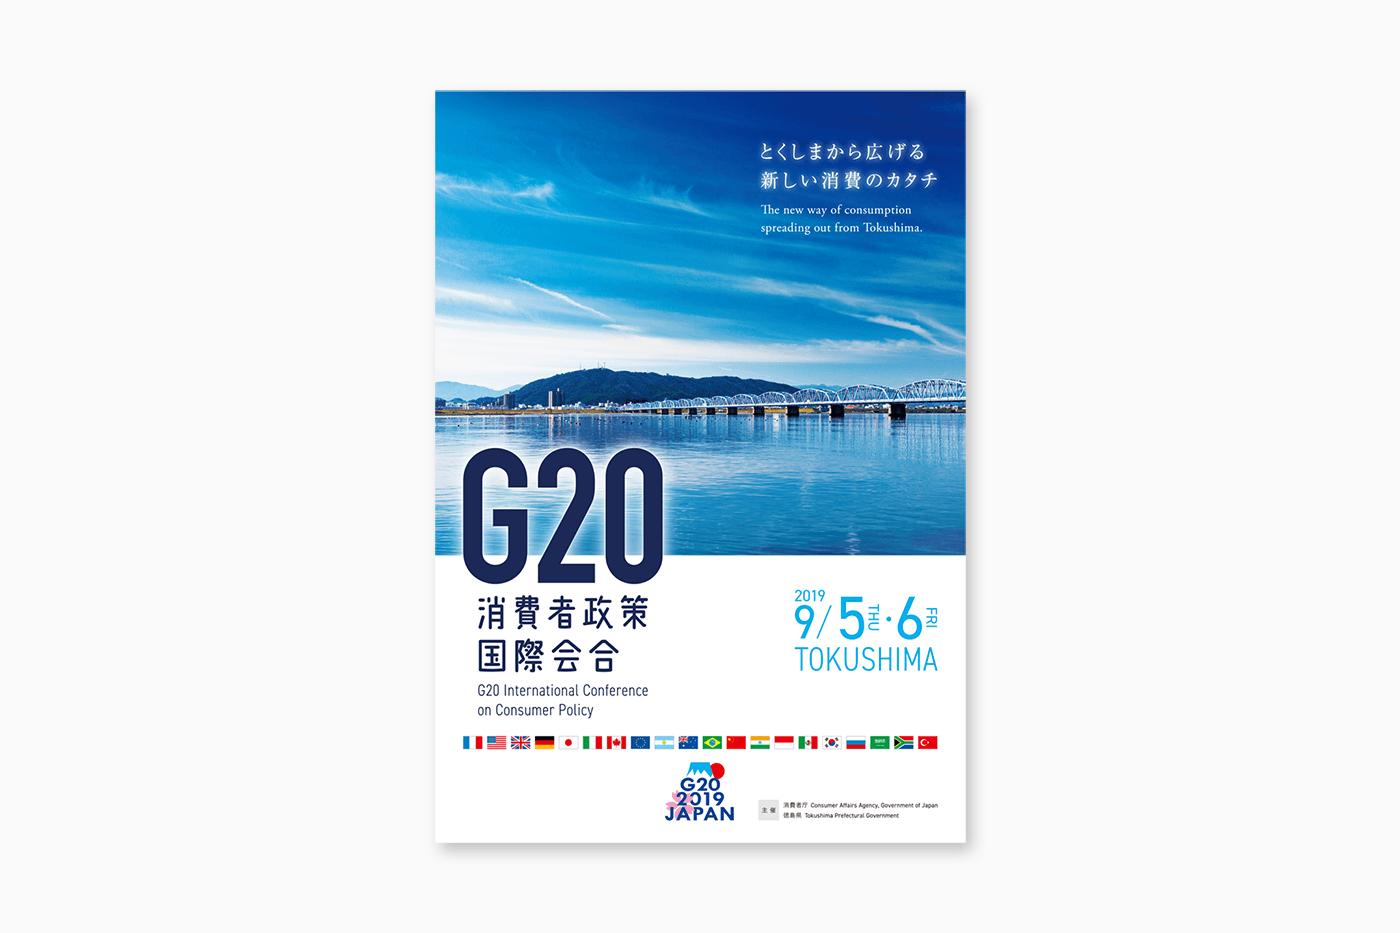 G20消費者政策国際会合ポスーター制作